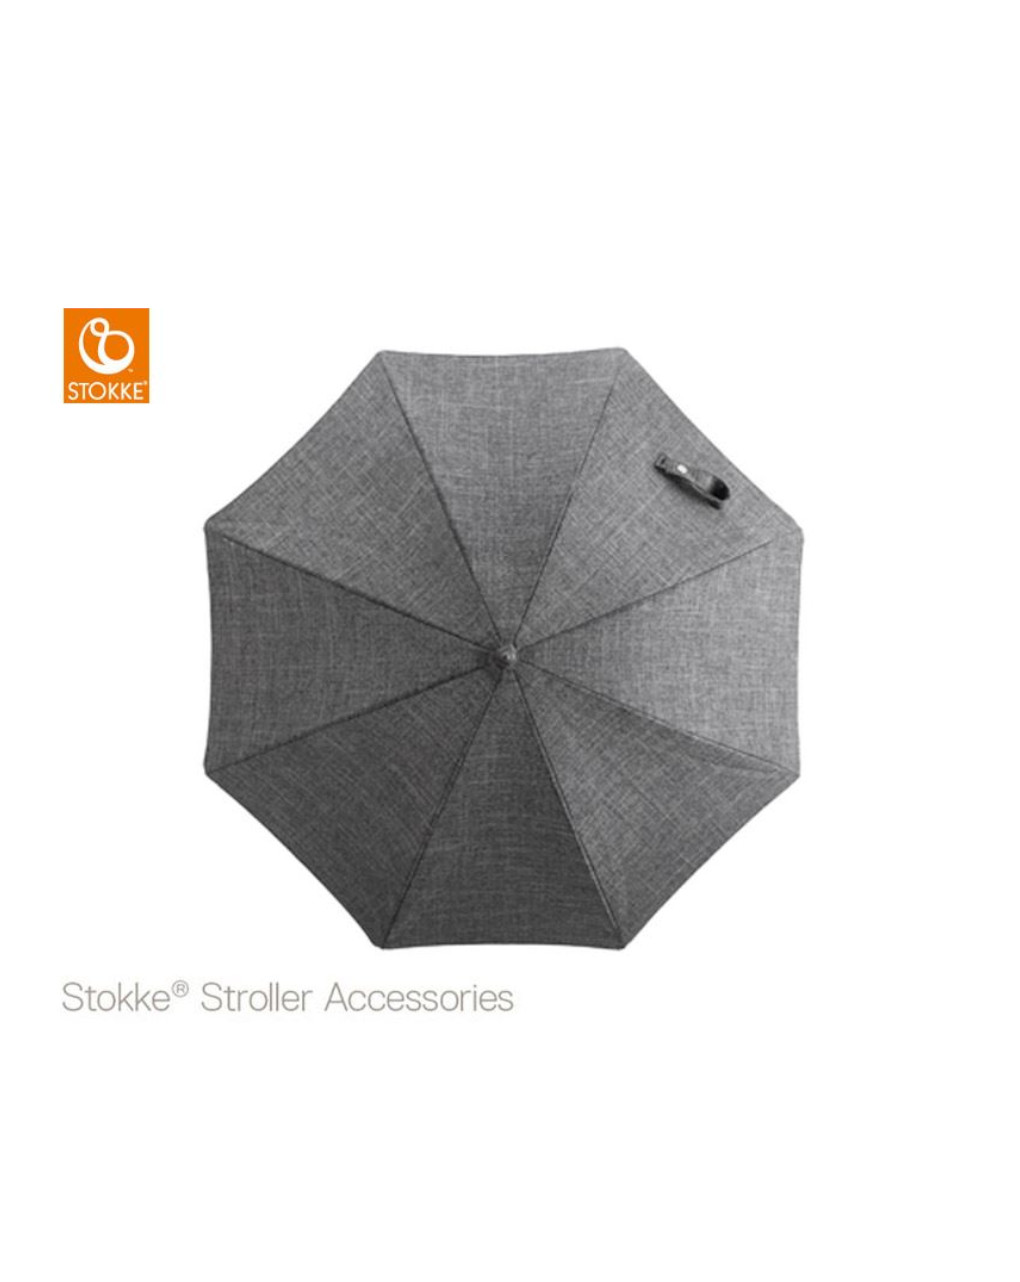 Stokke® passeggino ombrellino parasole - black melange - Stokke